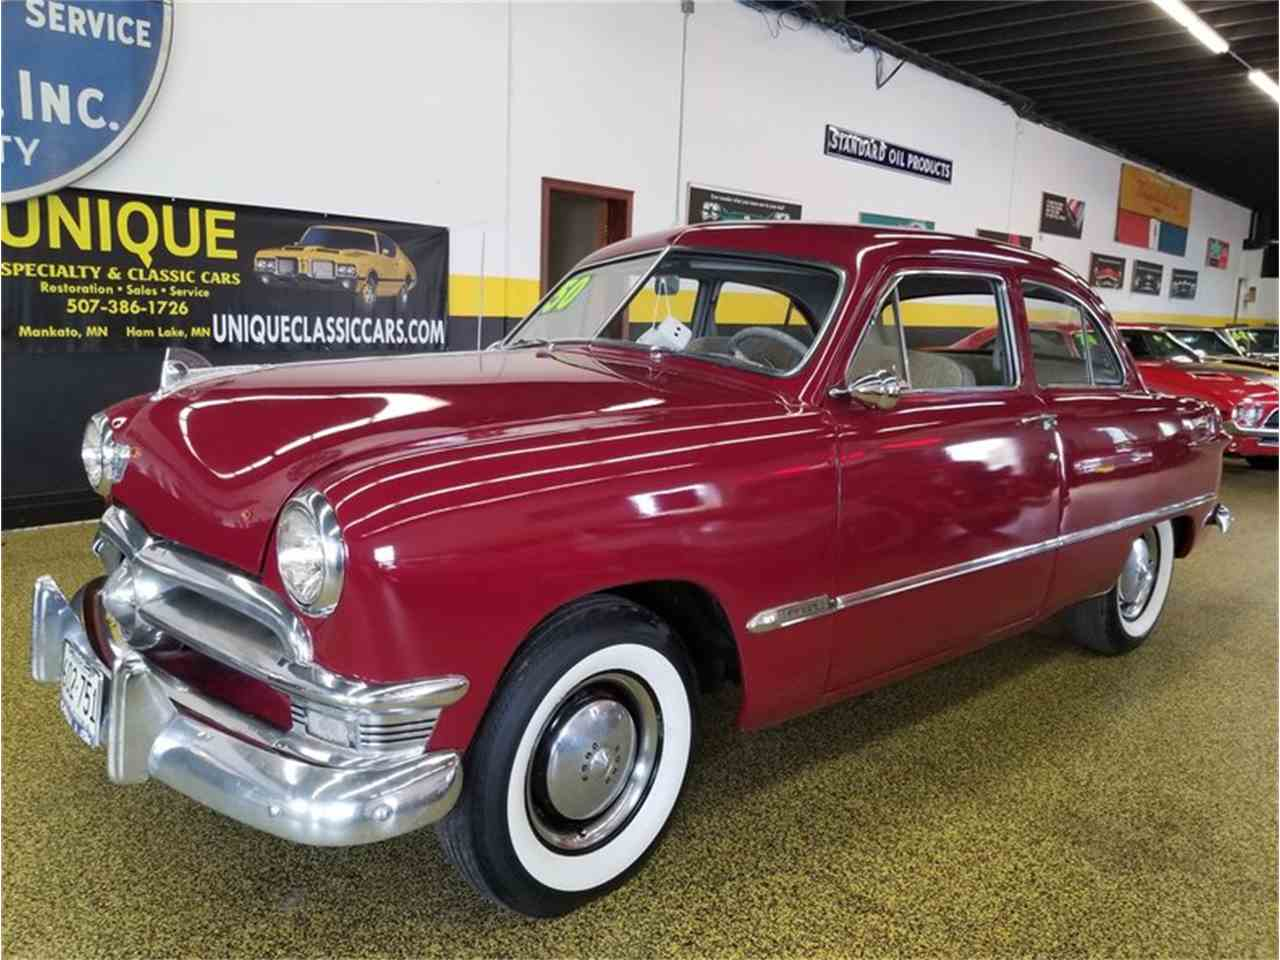 1950 Ford Customline 2dr Post for Sale | ClassicCars.com | CC-1024300